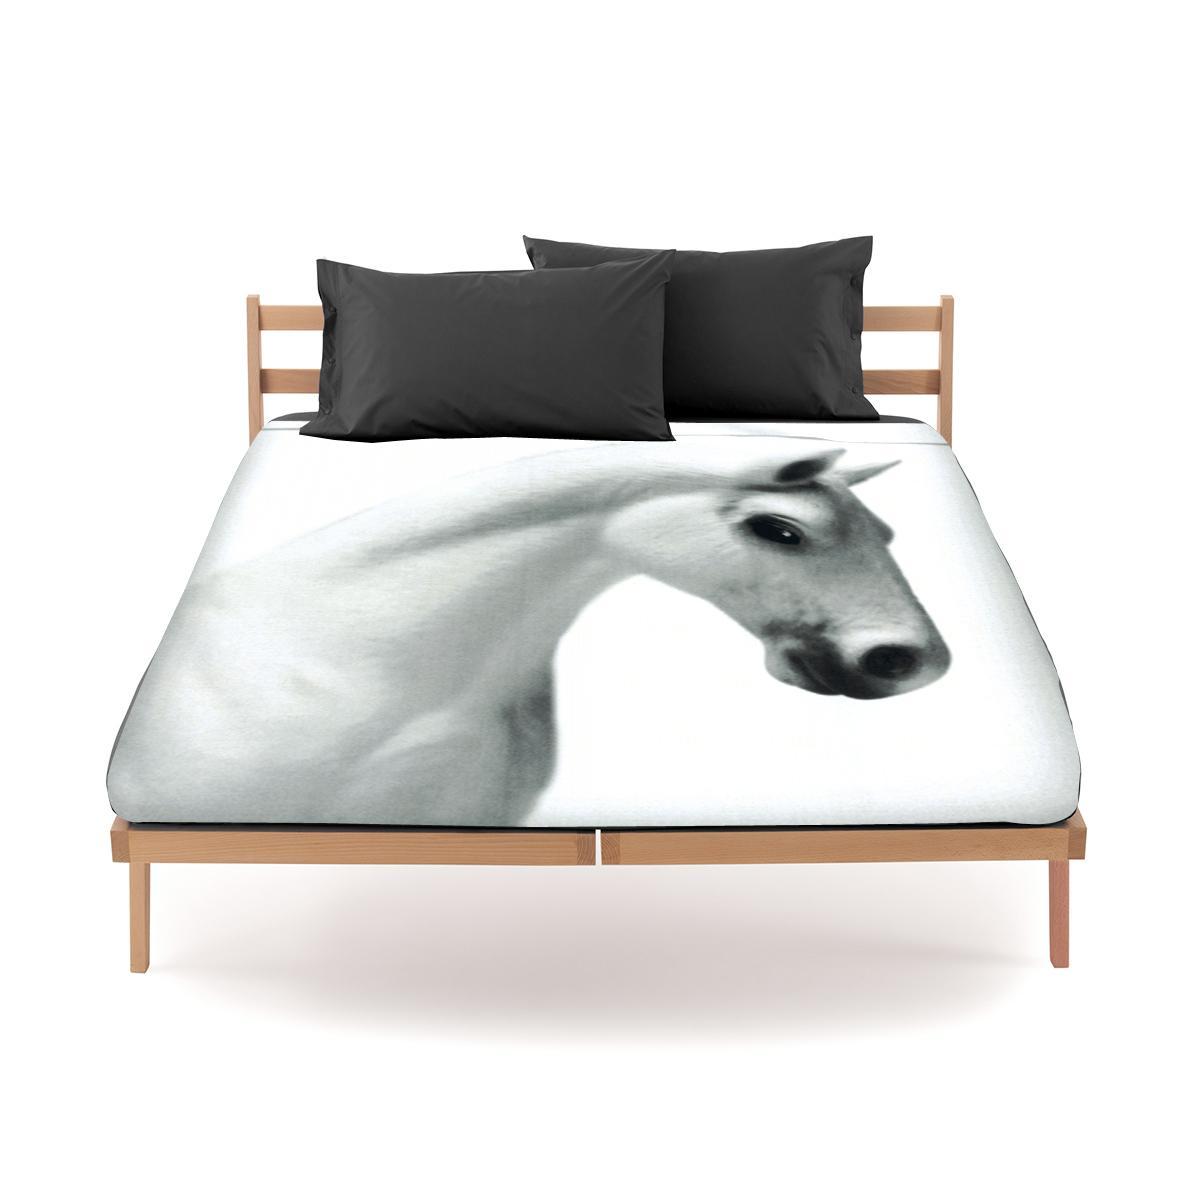 Set lenzuola bassetti by gardone per letto matrimoniale - Piumini leggeri letto ...